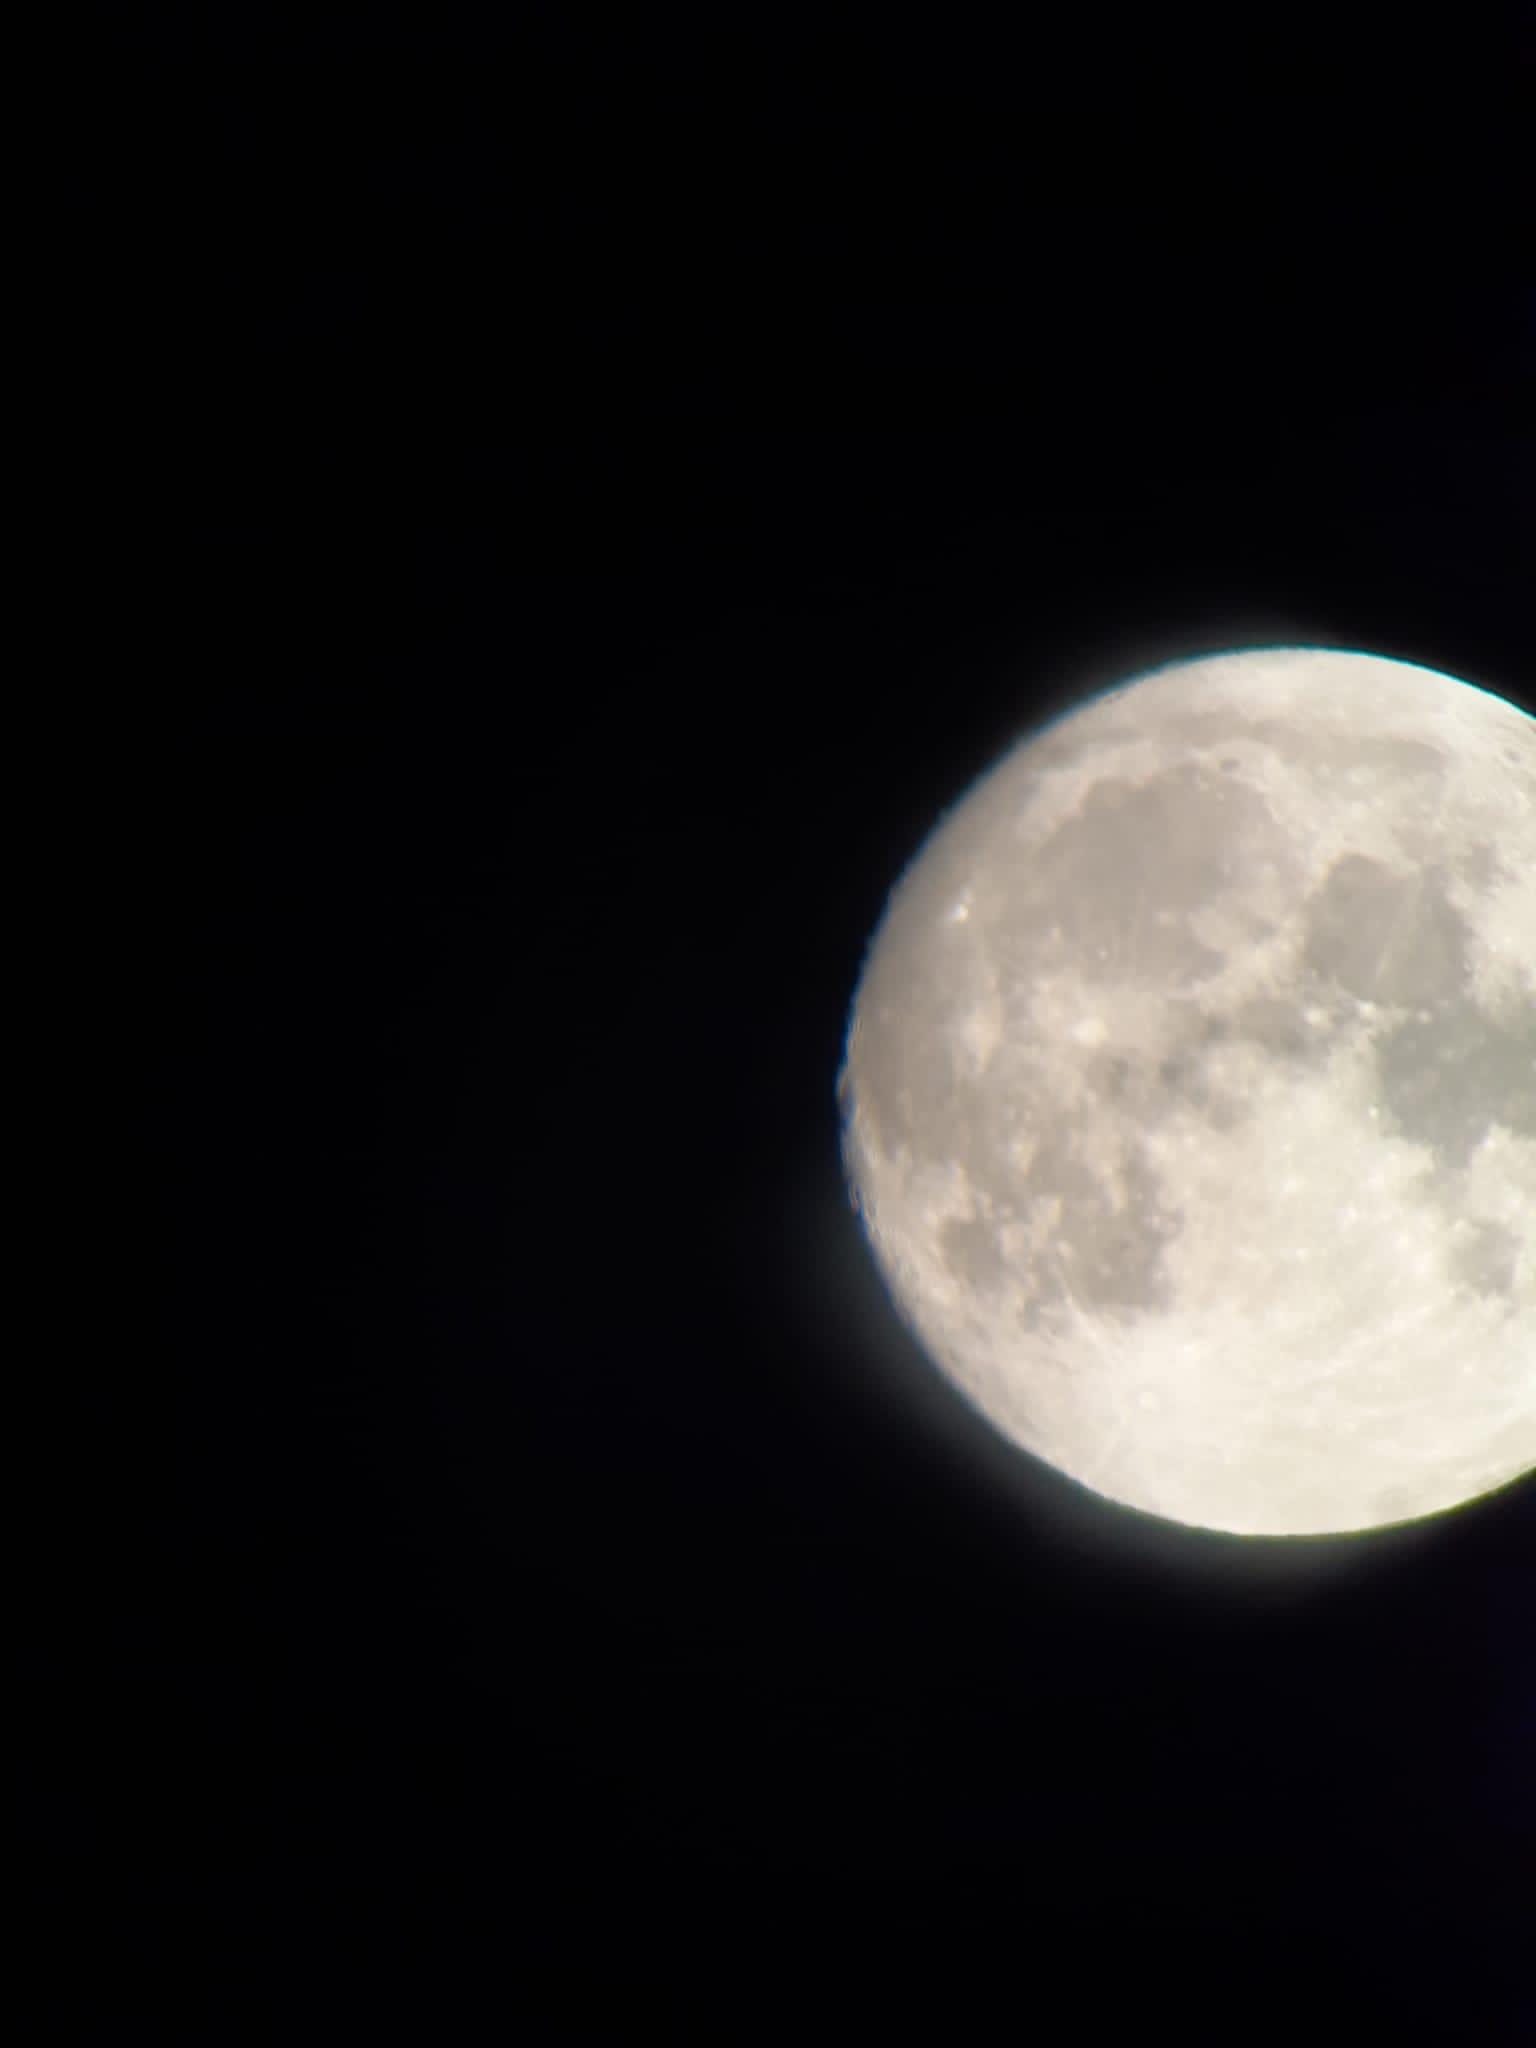 Telescopiazzando